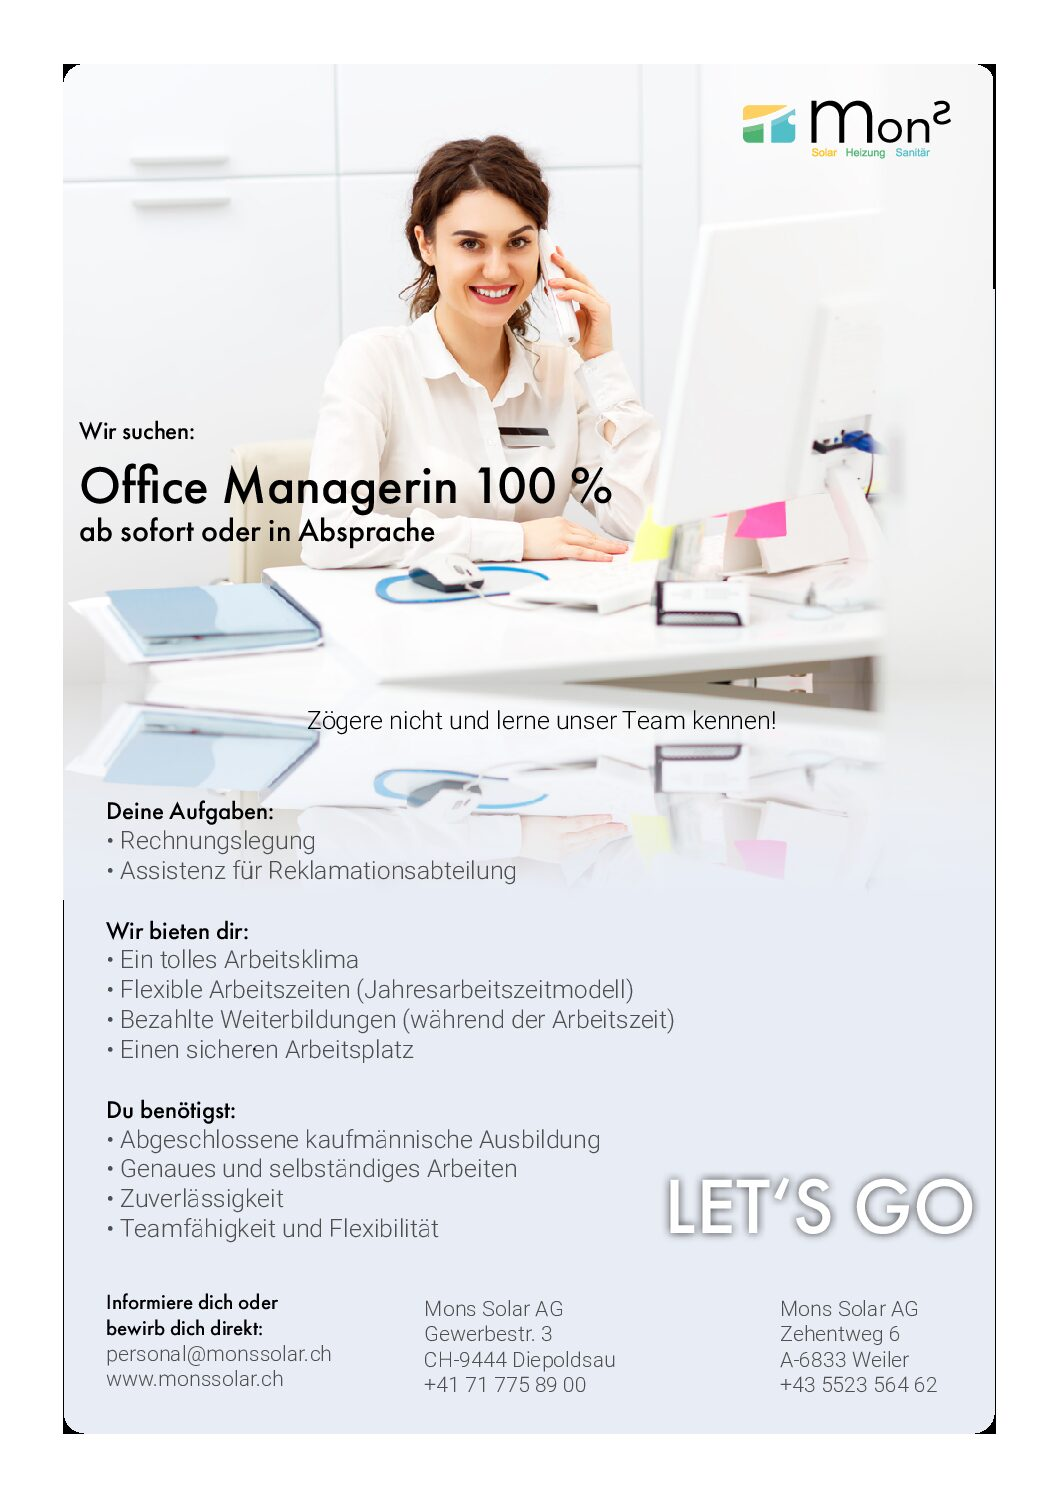 Office Rechnungslegung und Recht